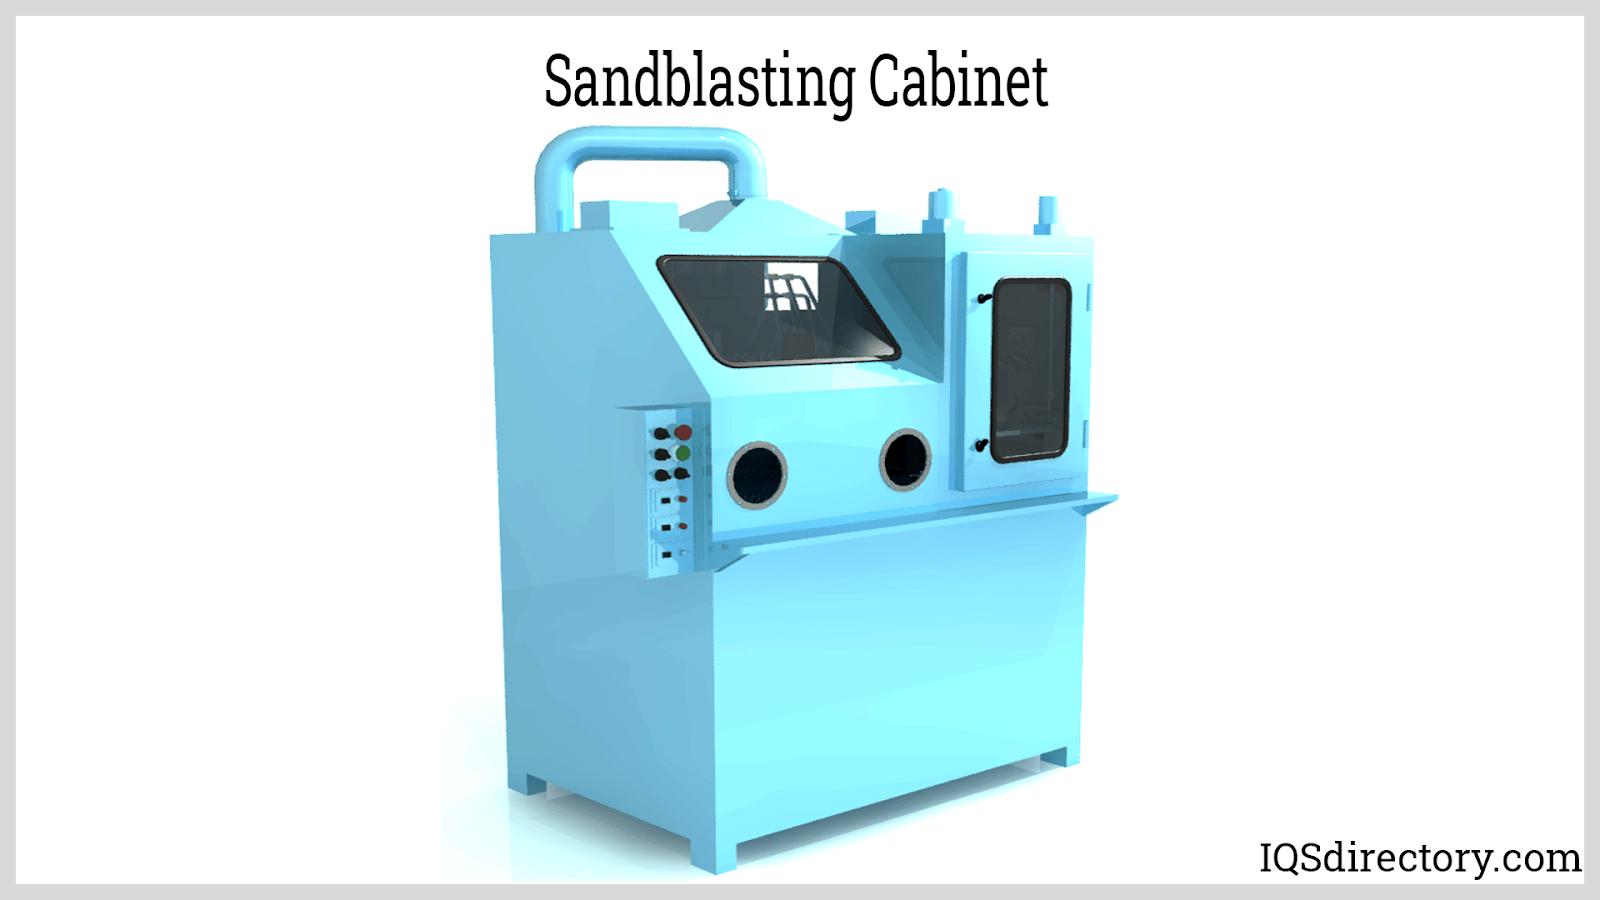 Sandblasting Cabinet